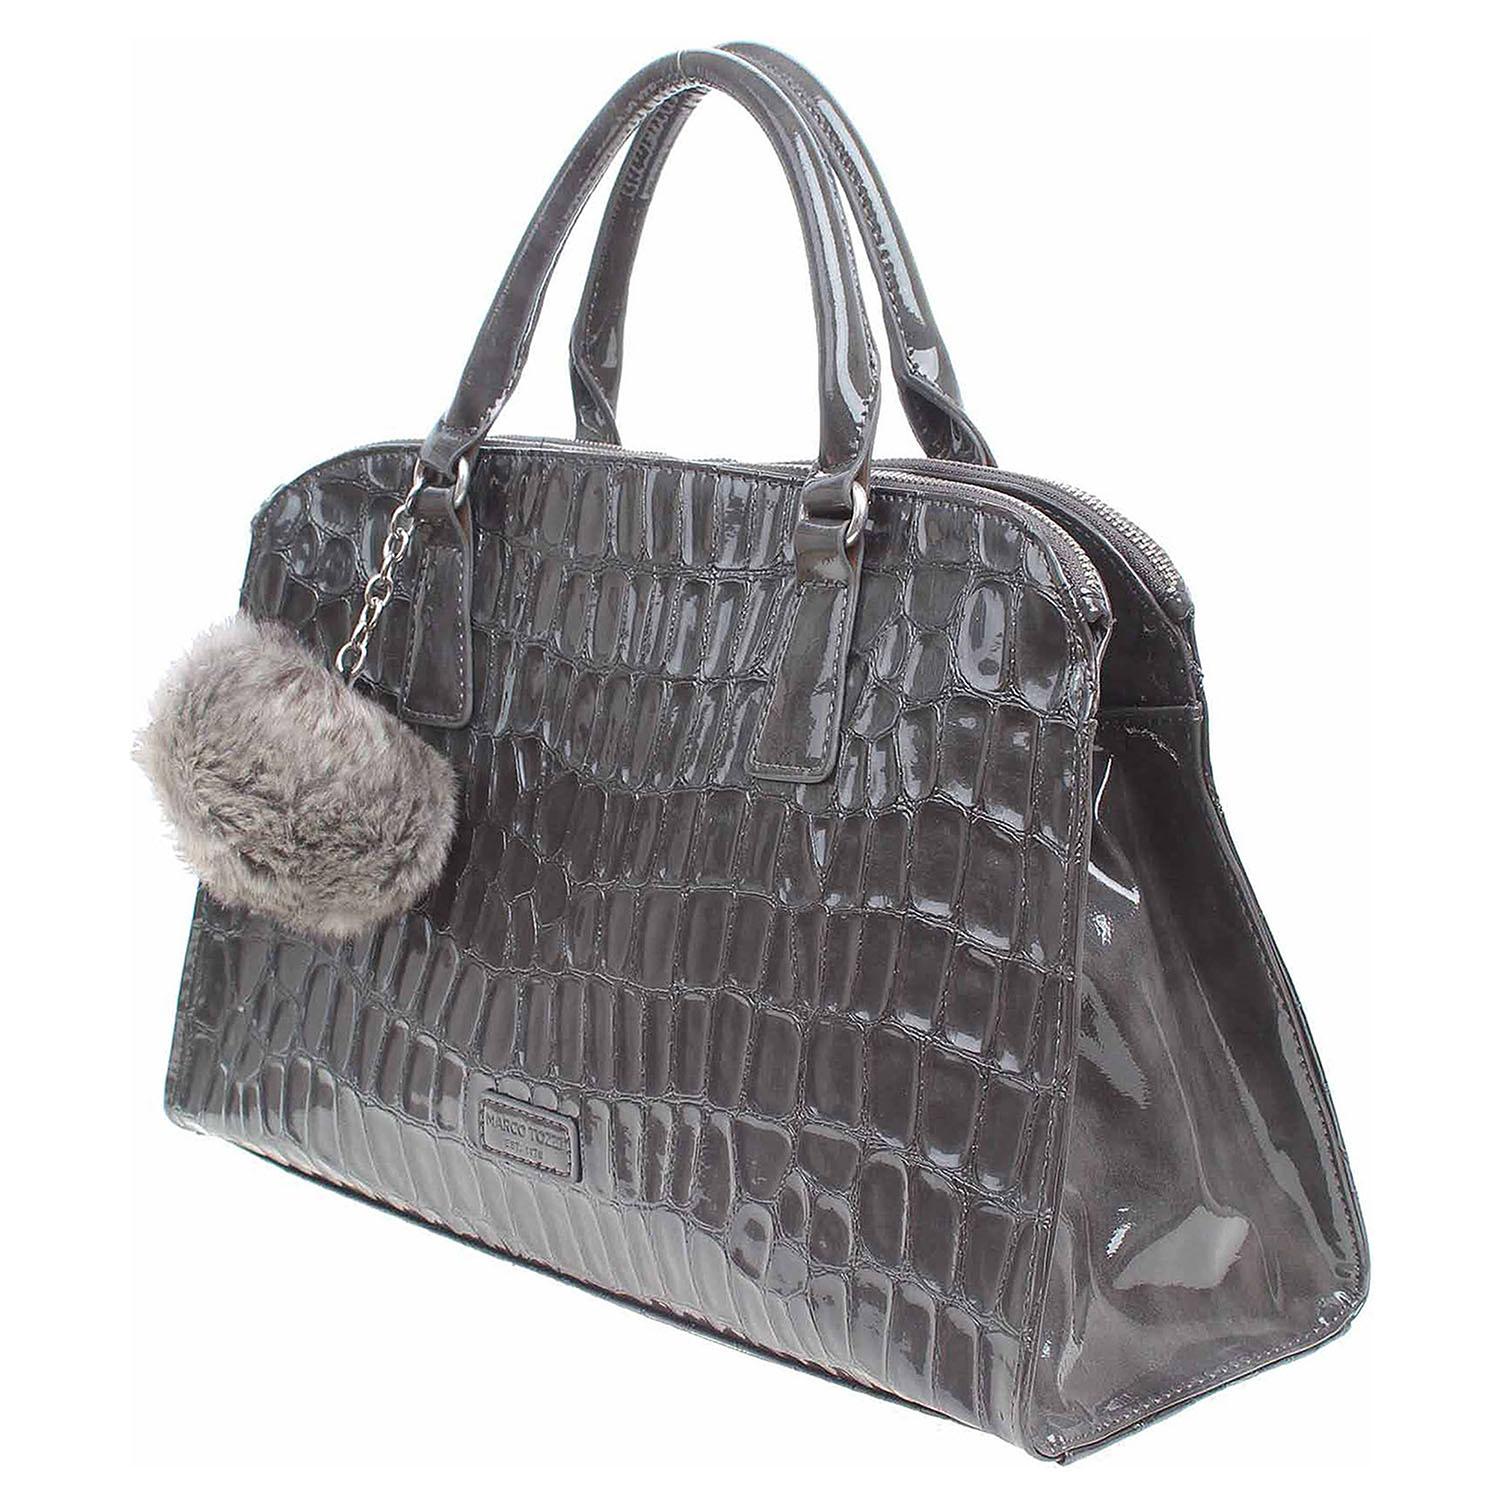 Ecco Marco Tozzi dámská kabelka 2-61107-29 šedá 11891247